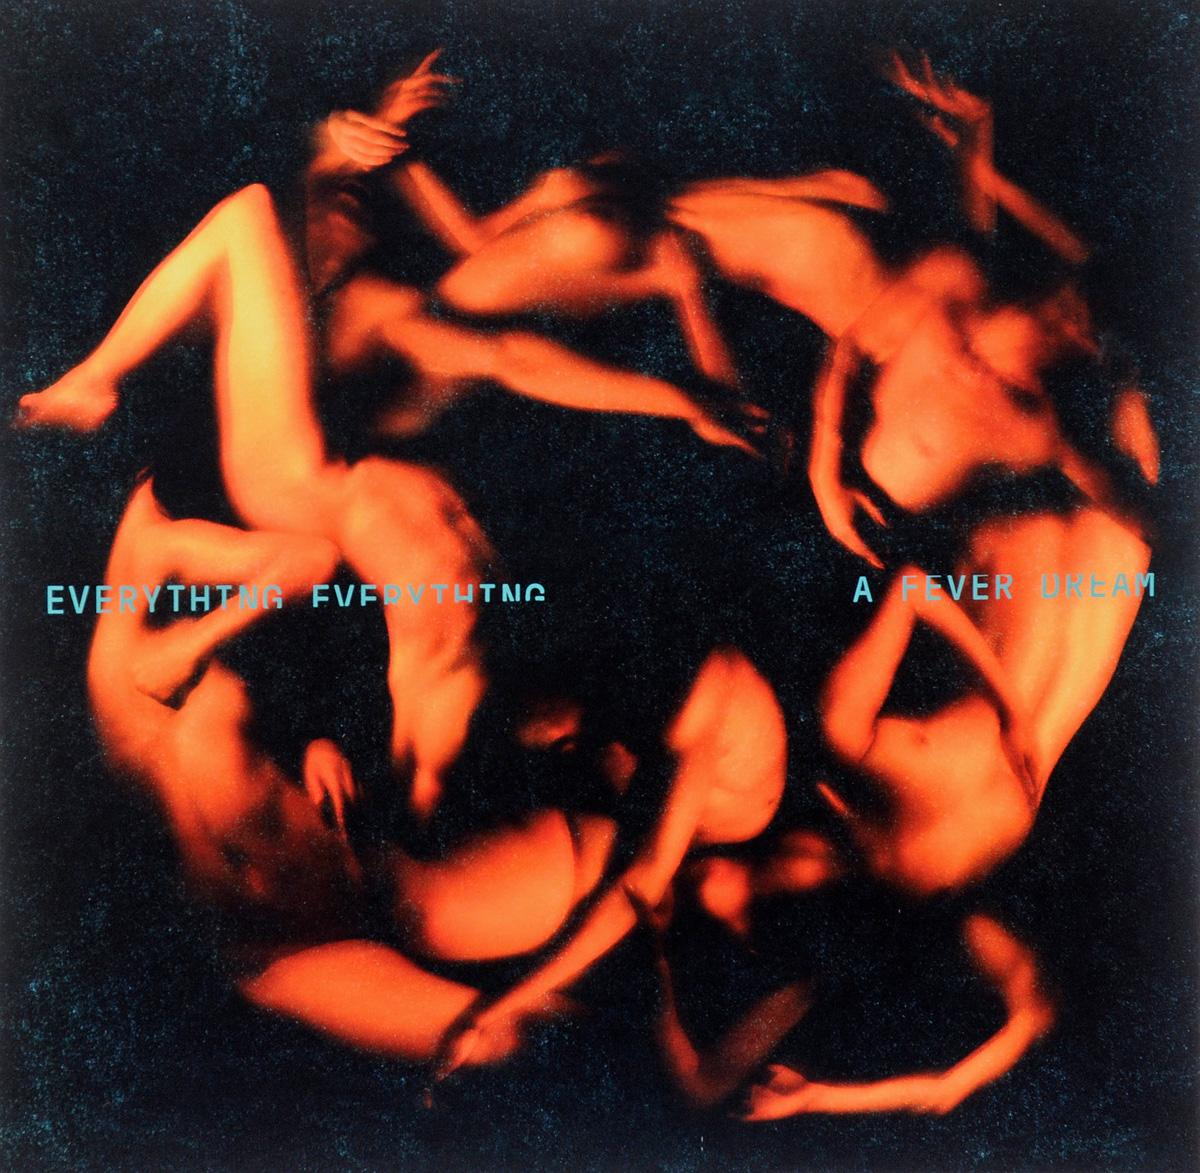 Everything Everything Everything Everything. A Fever Dream (LP) цена